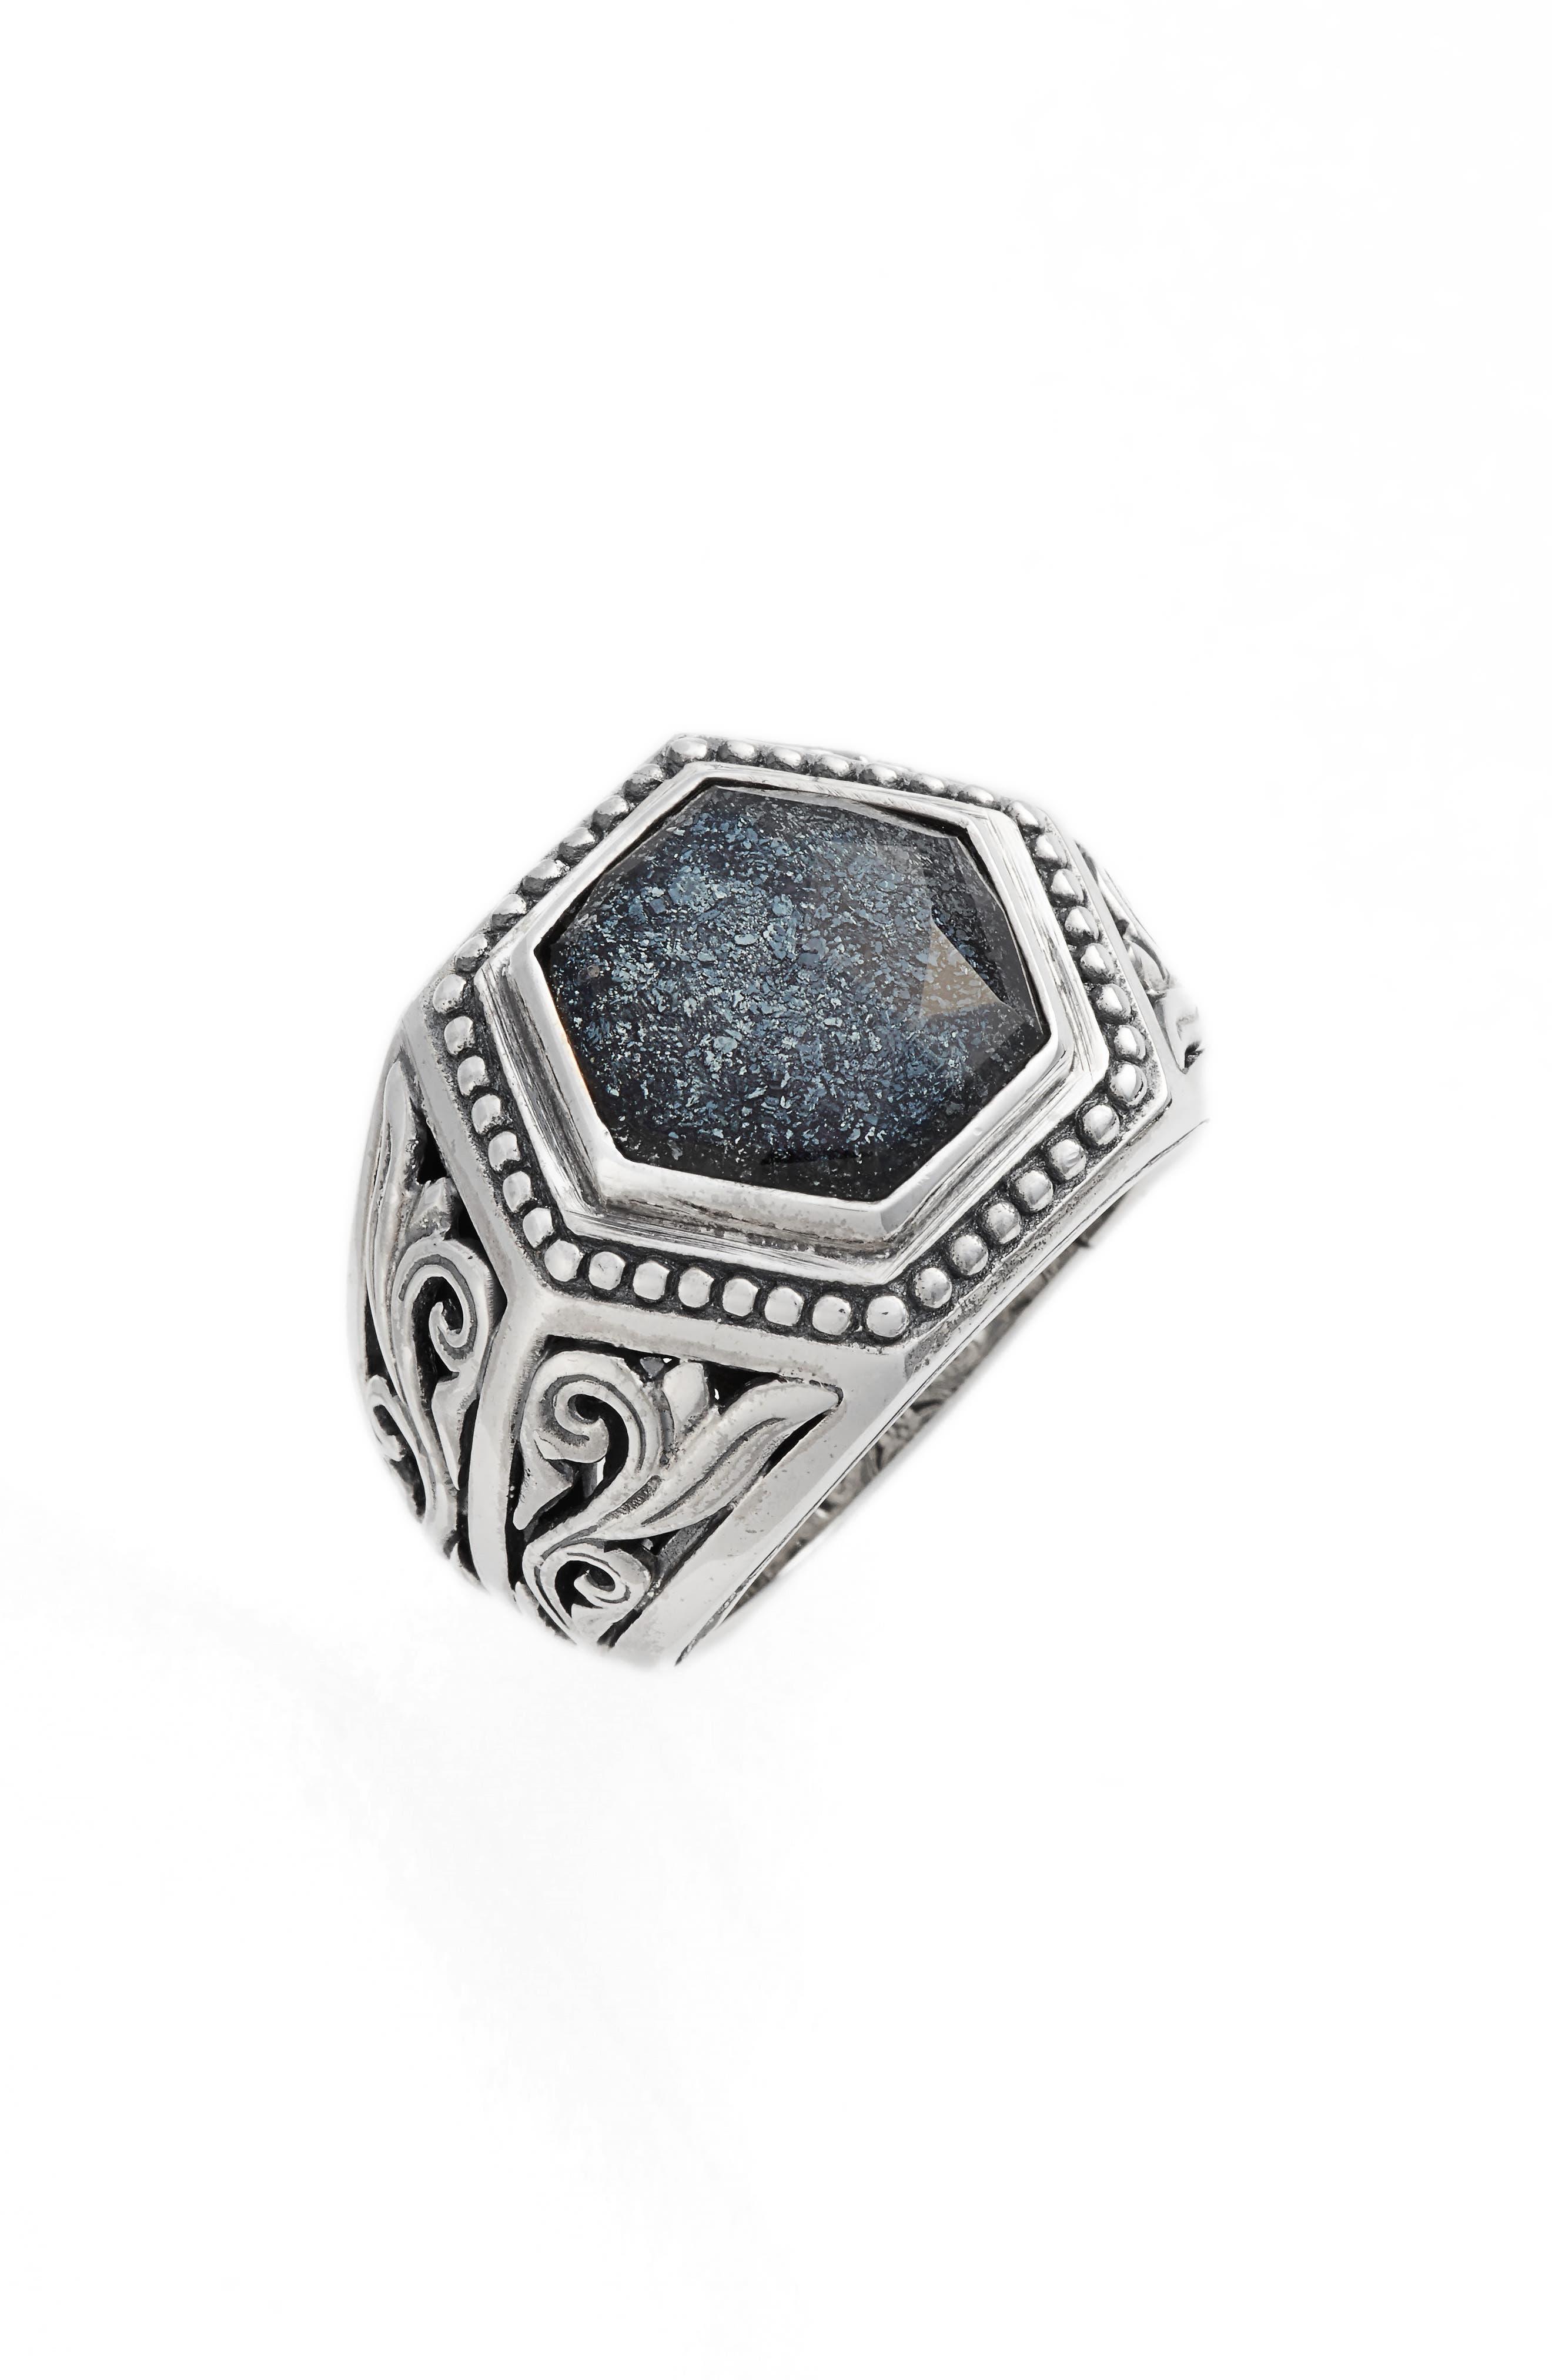 Santorini Hematite Hexagon Ring,                             Main thumbnail 1, color,                             Silver/ Hematite